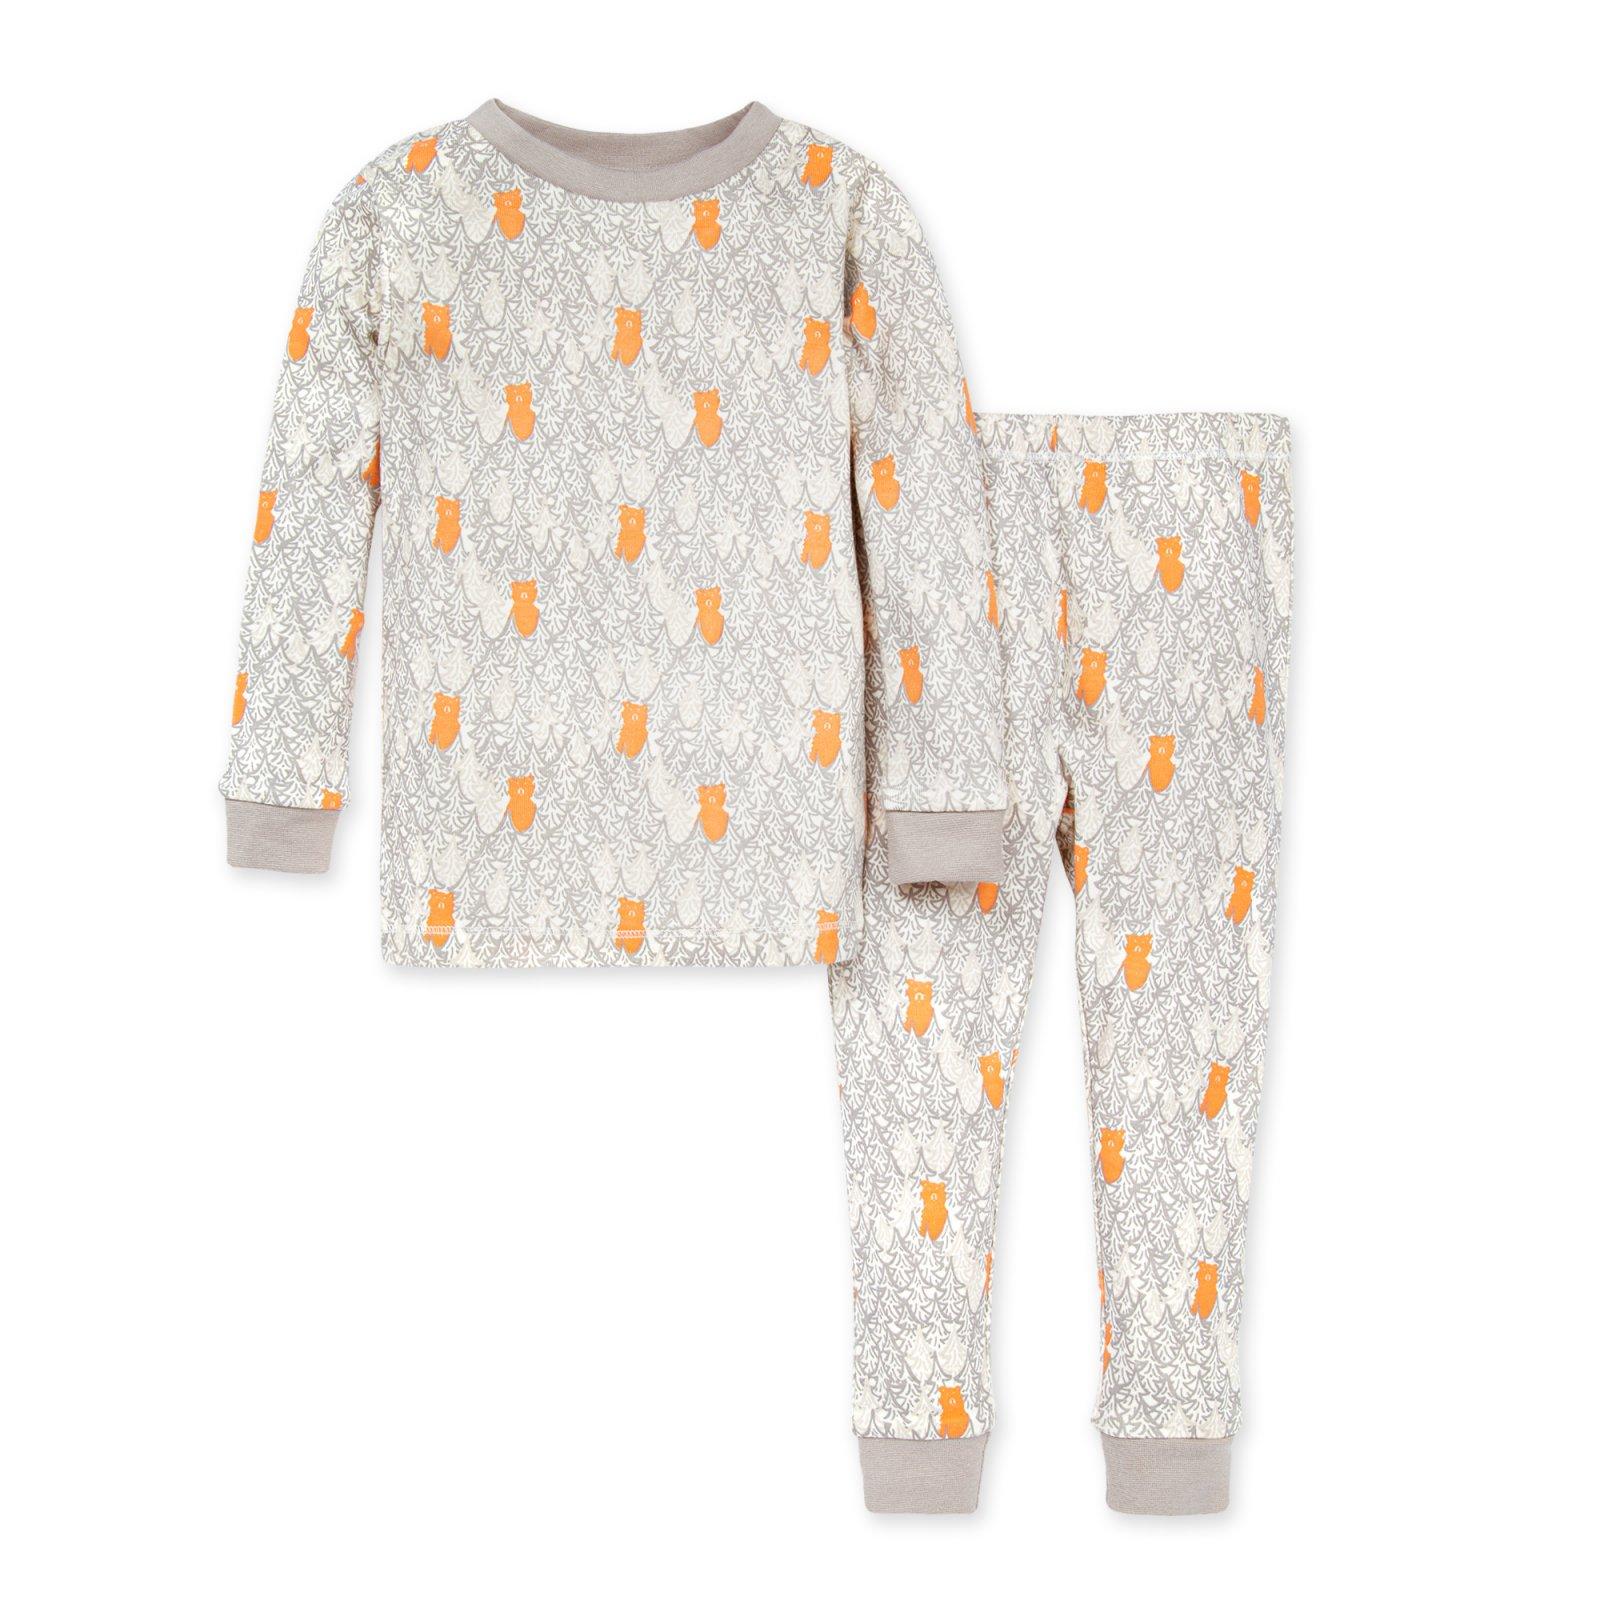 Burt's Bees Organic Kid's Pajamas - Bear Forest TD27238